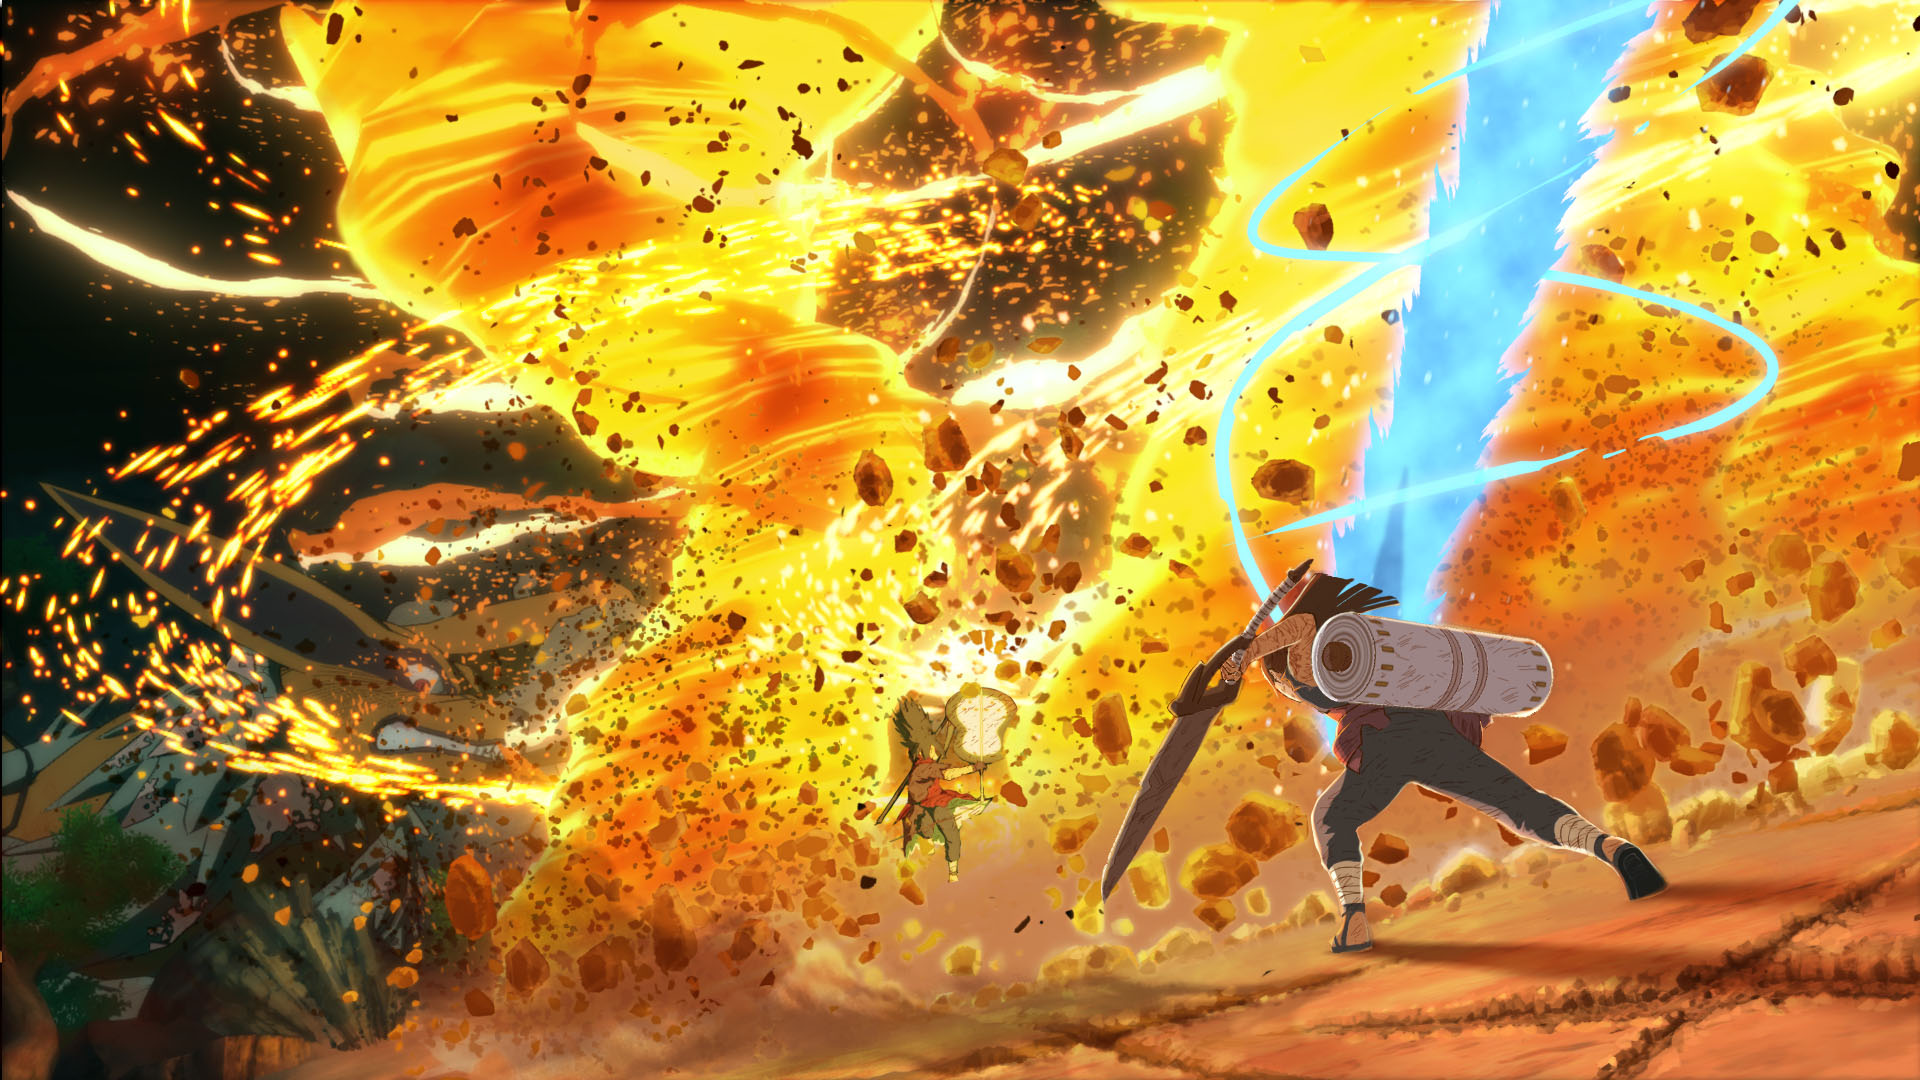 http://www.dsogaming.com/wp-content/uploads/2014/12/NARUTO-SHIPPUDEN-Ultimate-Ninja-STORM-4-feature.jpg